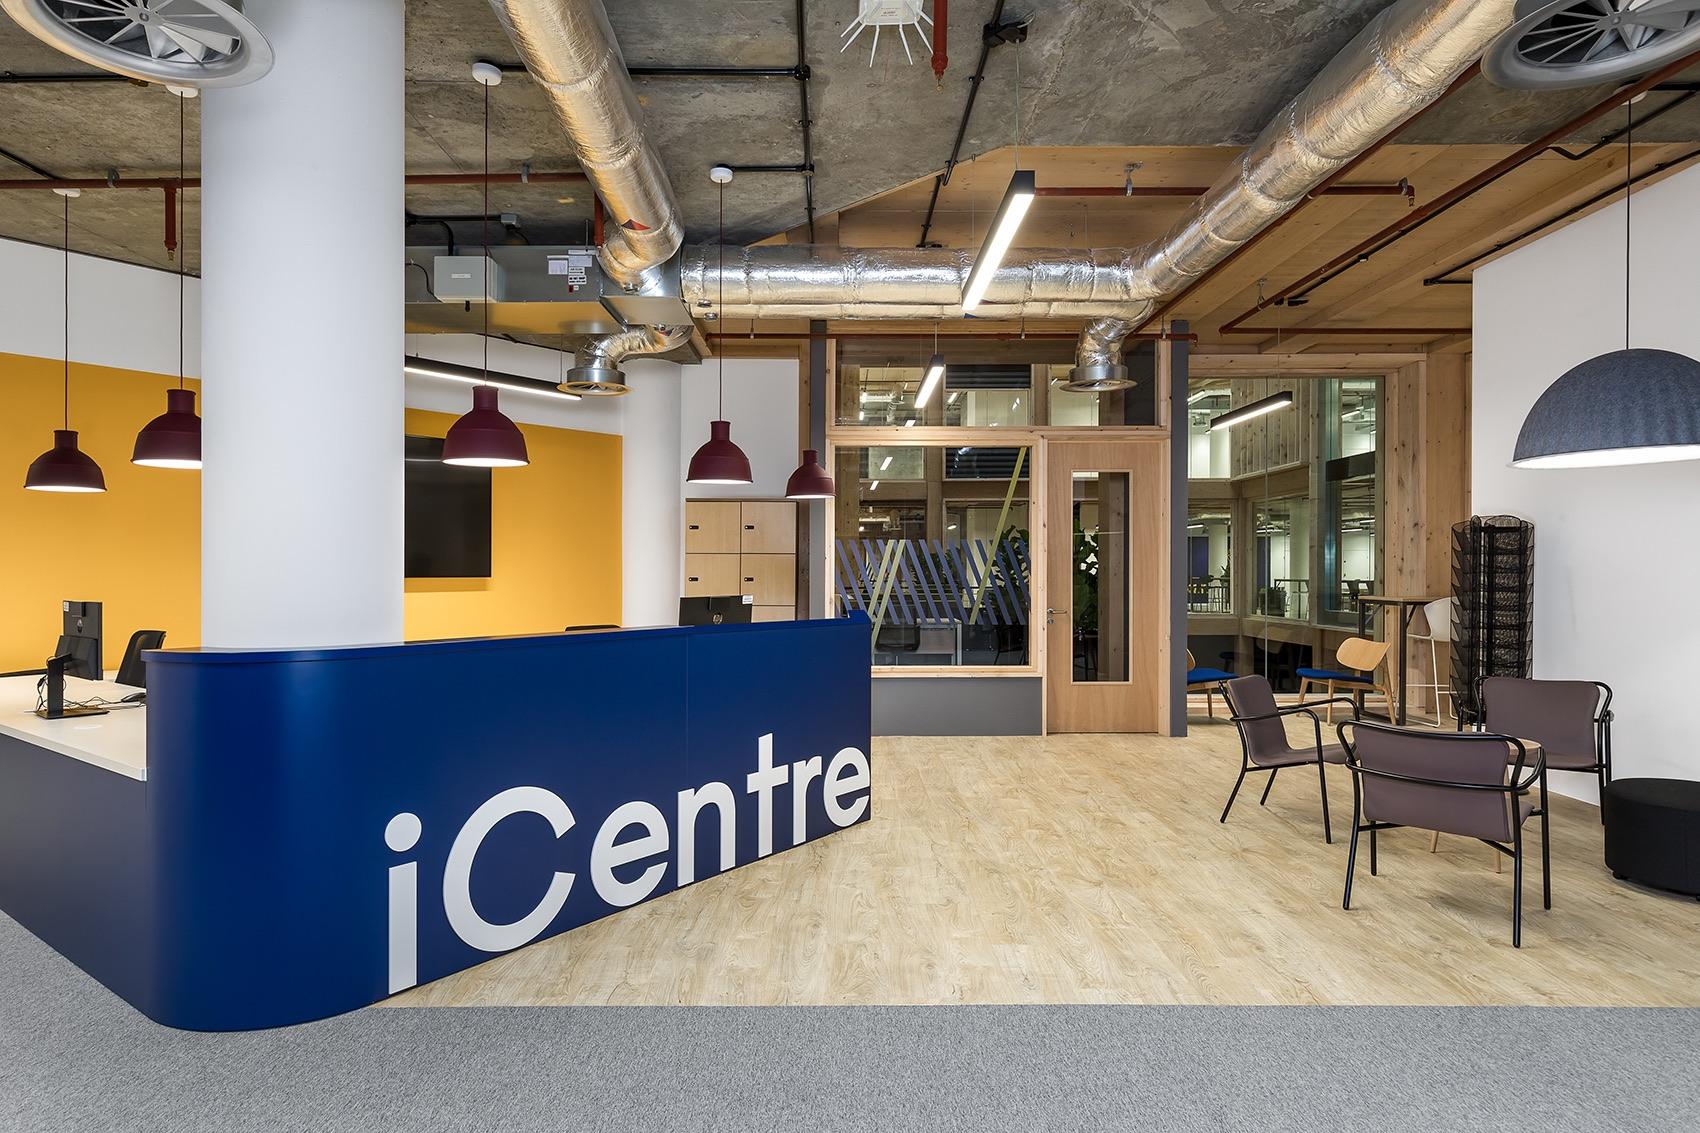 anglia-ruskin-university-office-london-2